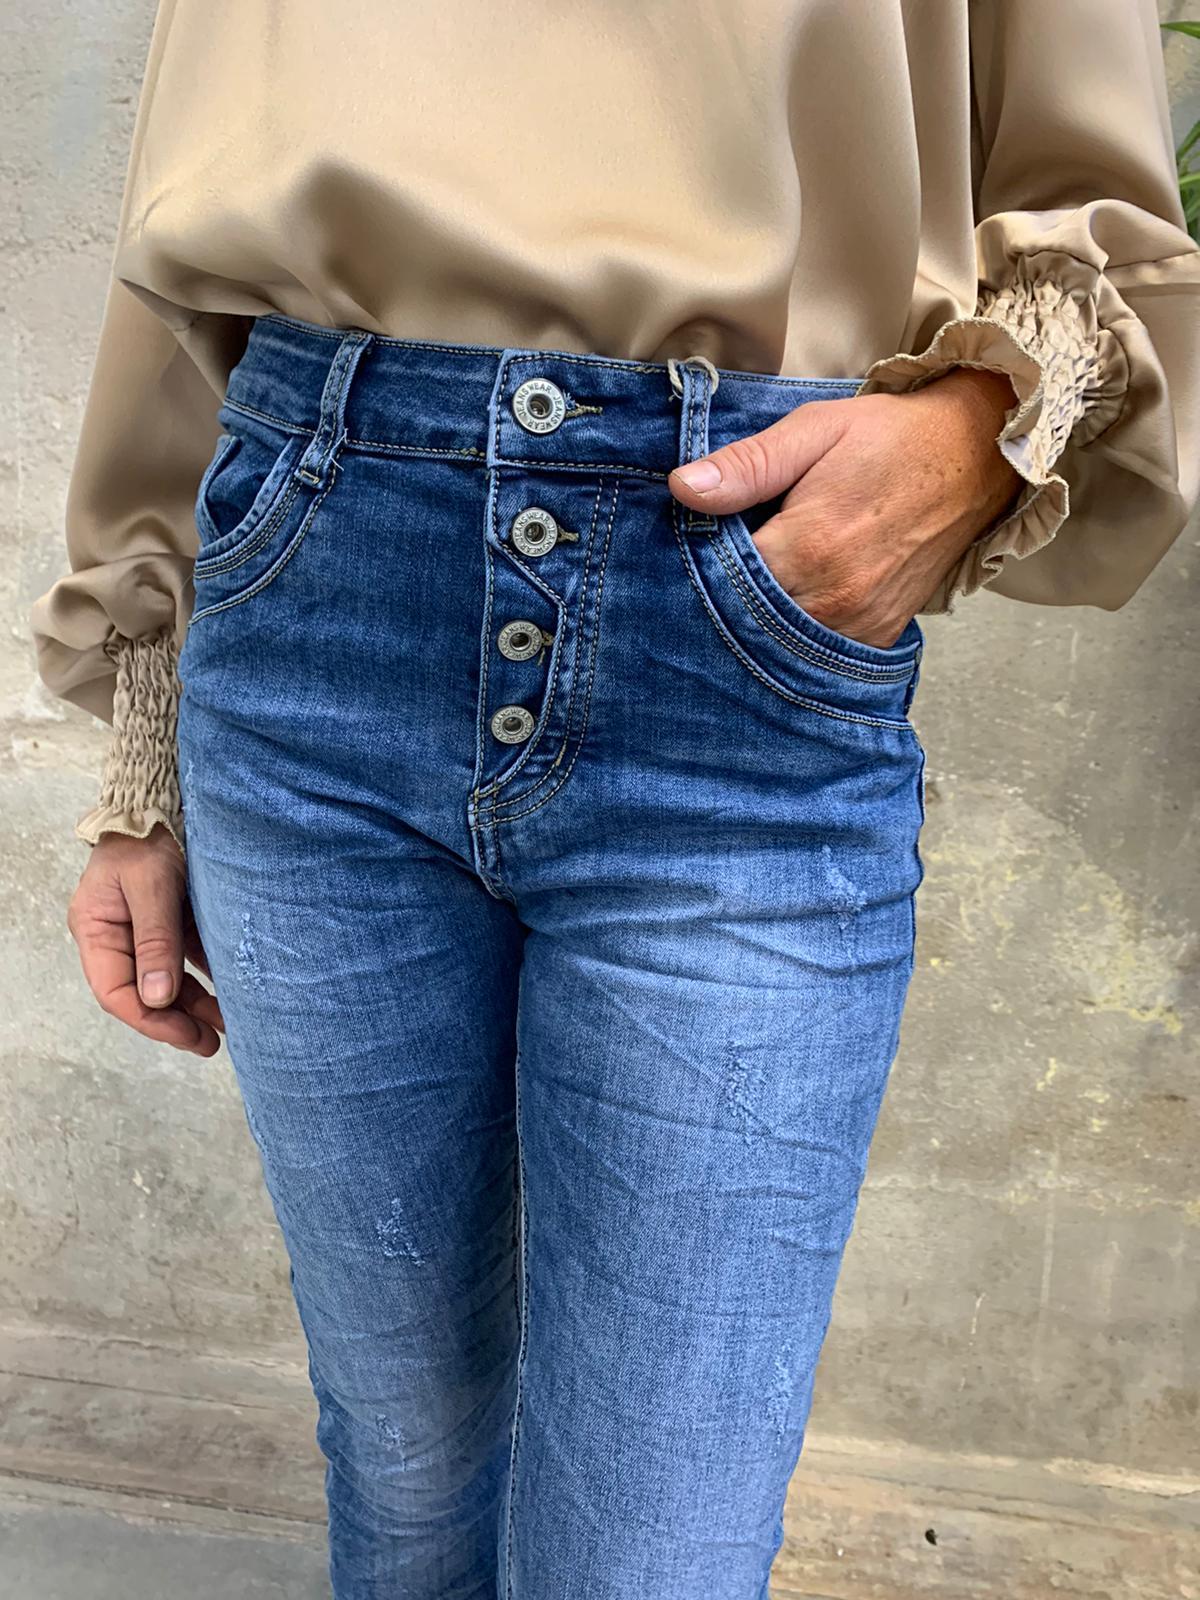 Jeans JW2648 - Denim fram